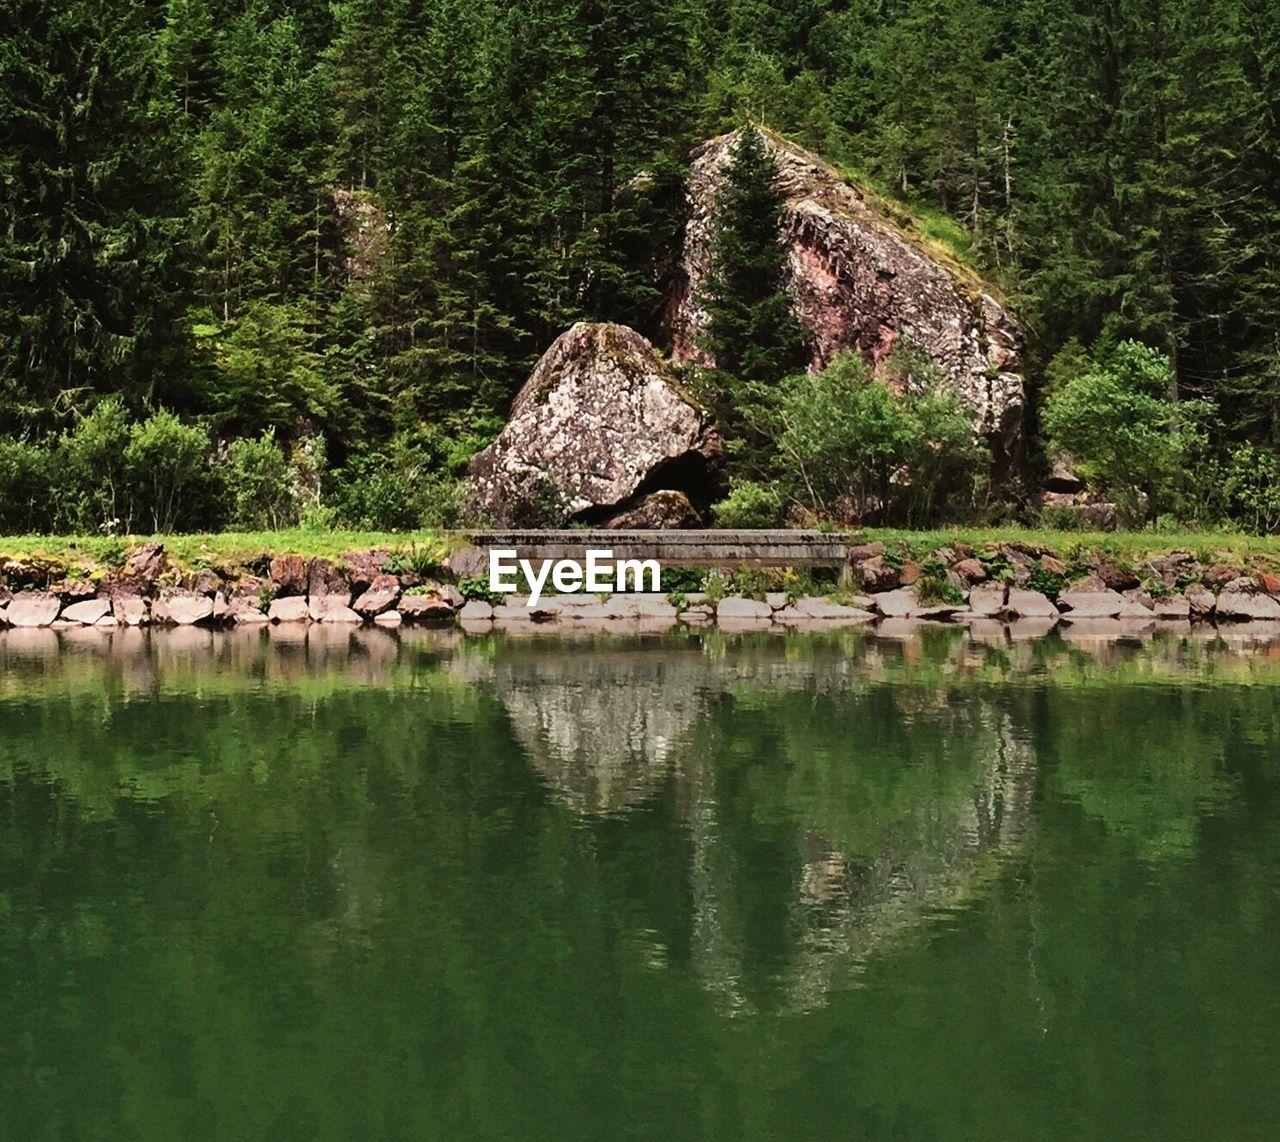 Rocks at lakeshore against trees